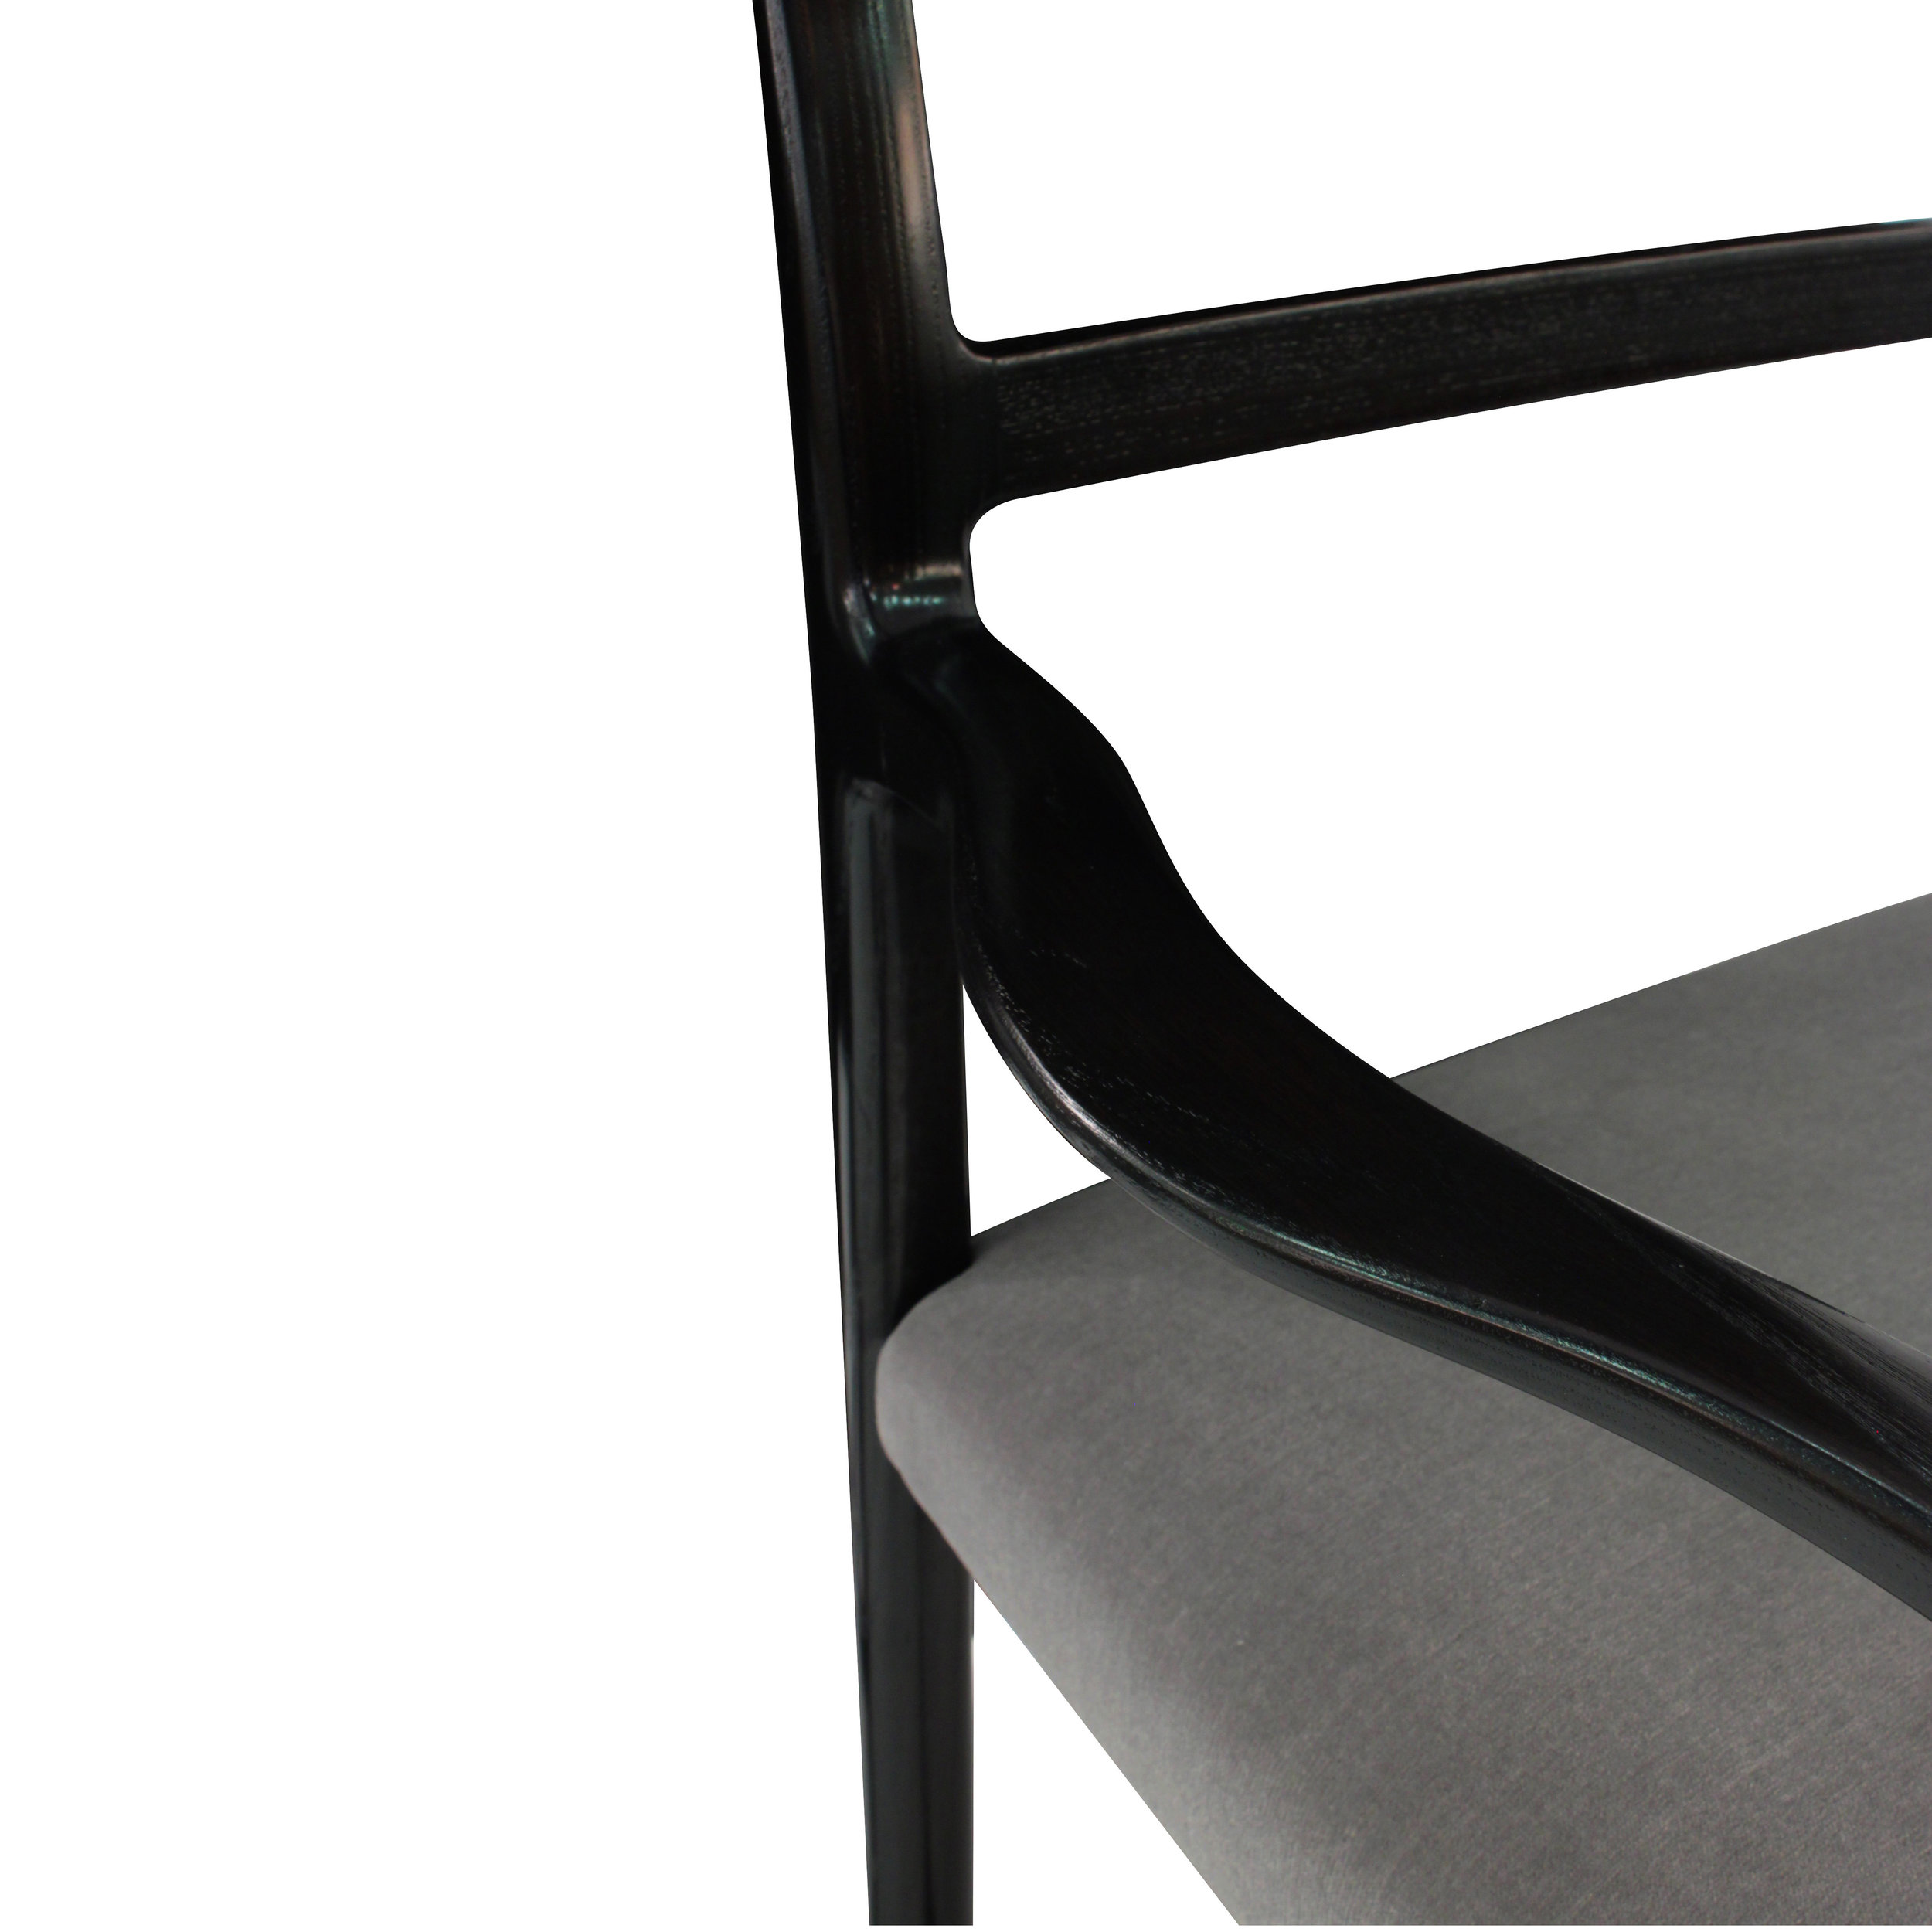 Dunbar 150 setof8 drk ash diningchairs151 detail4 hires.jpg